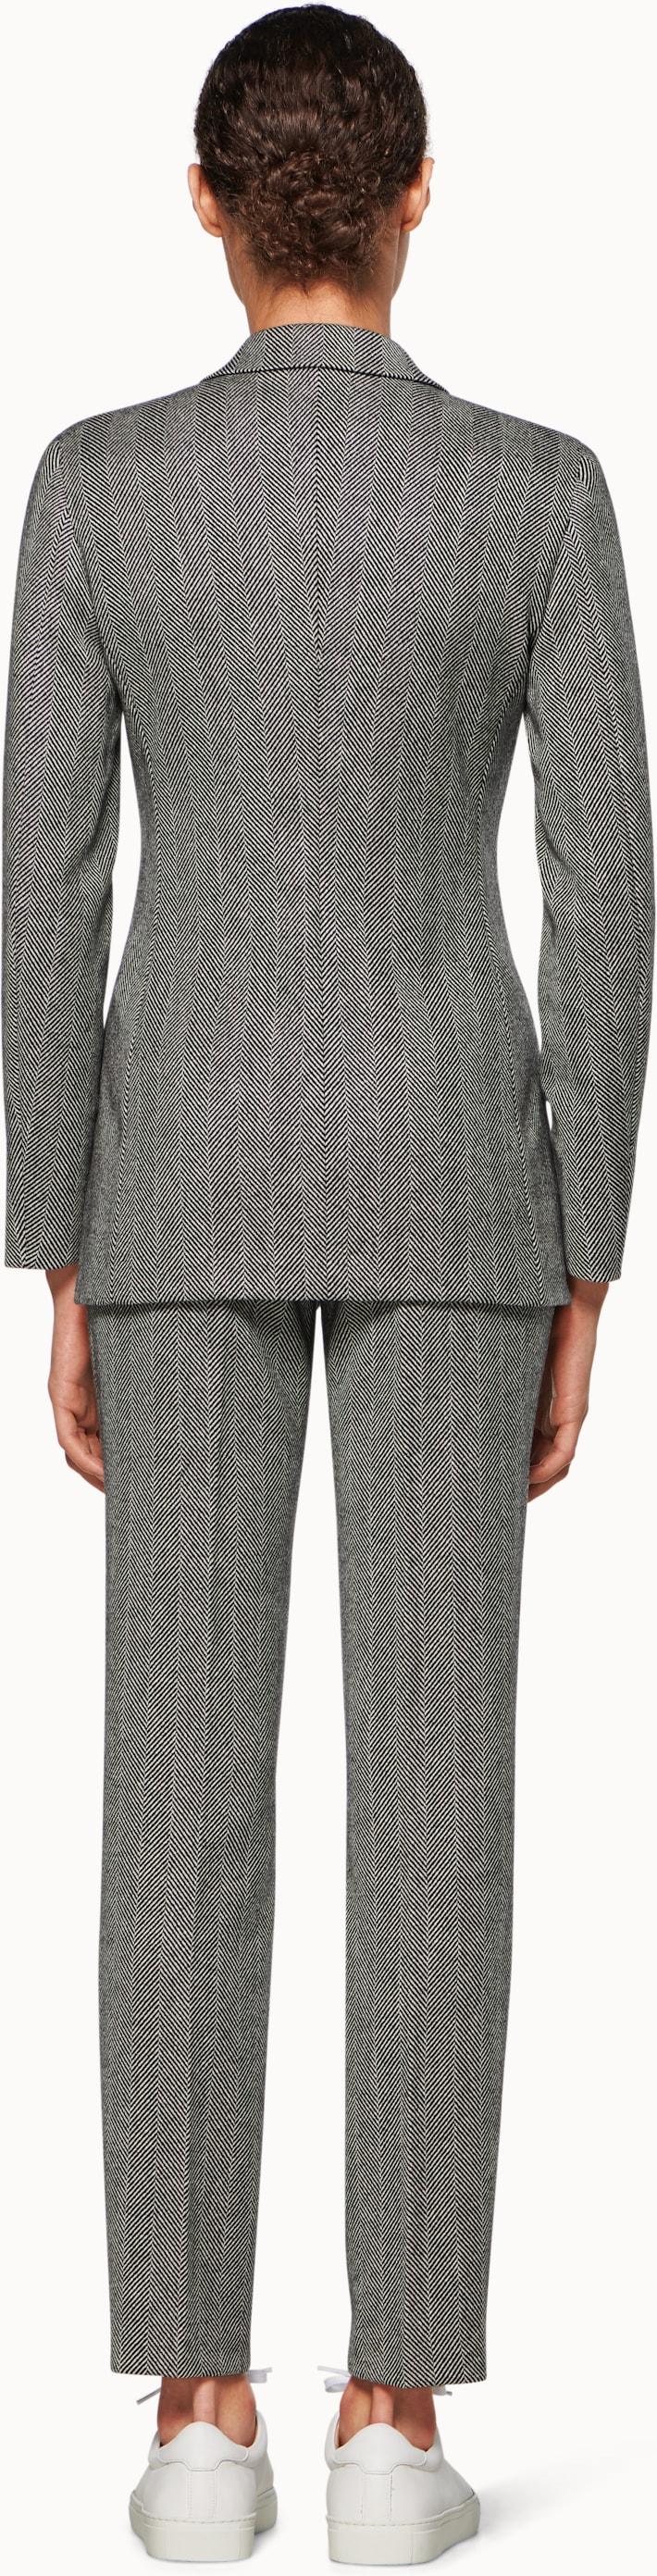 Joss Grey Herringbone Suit